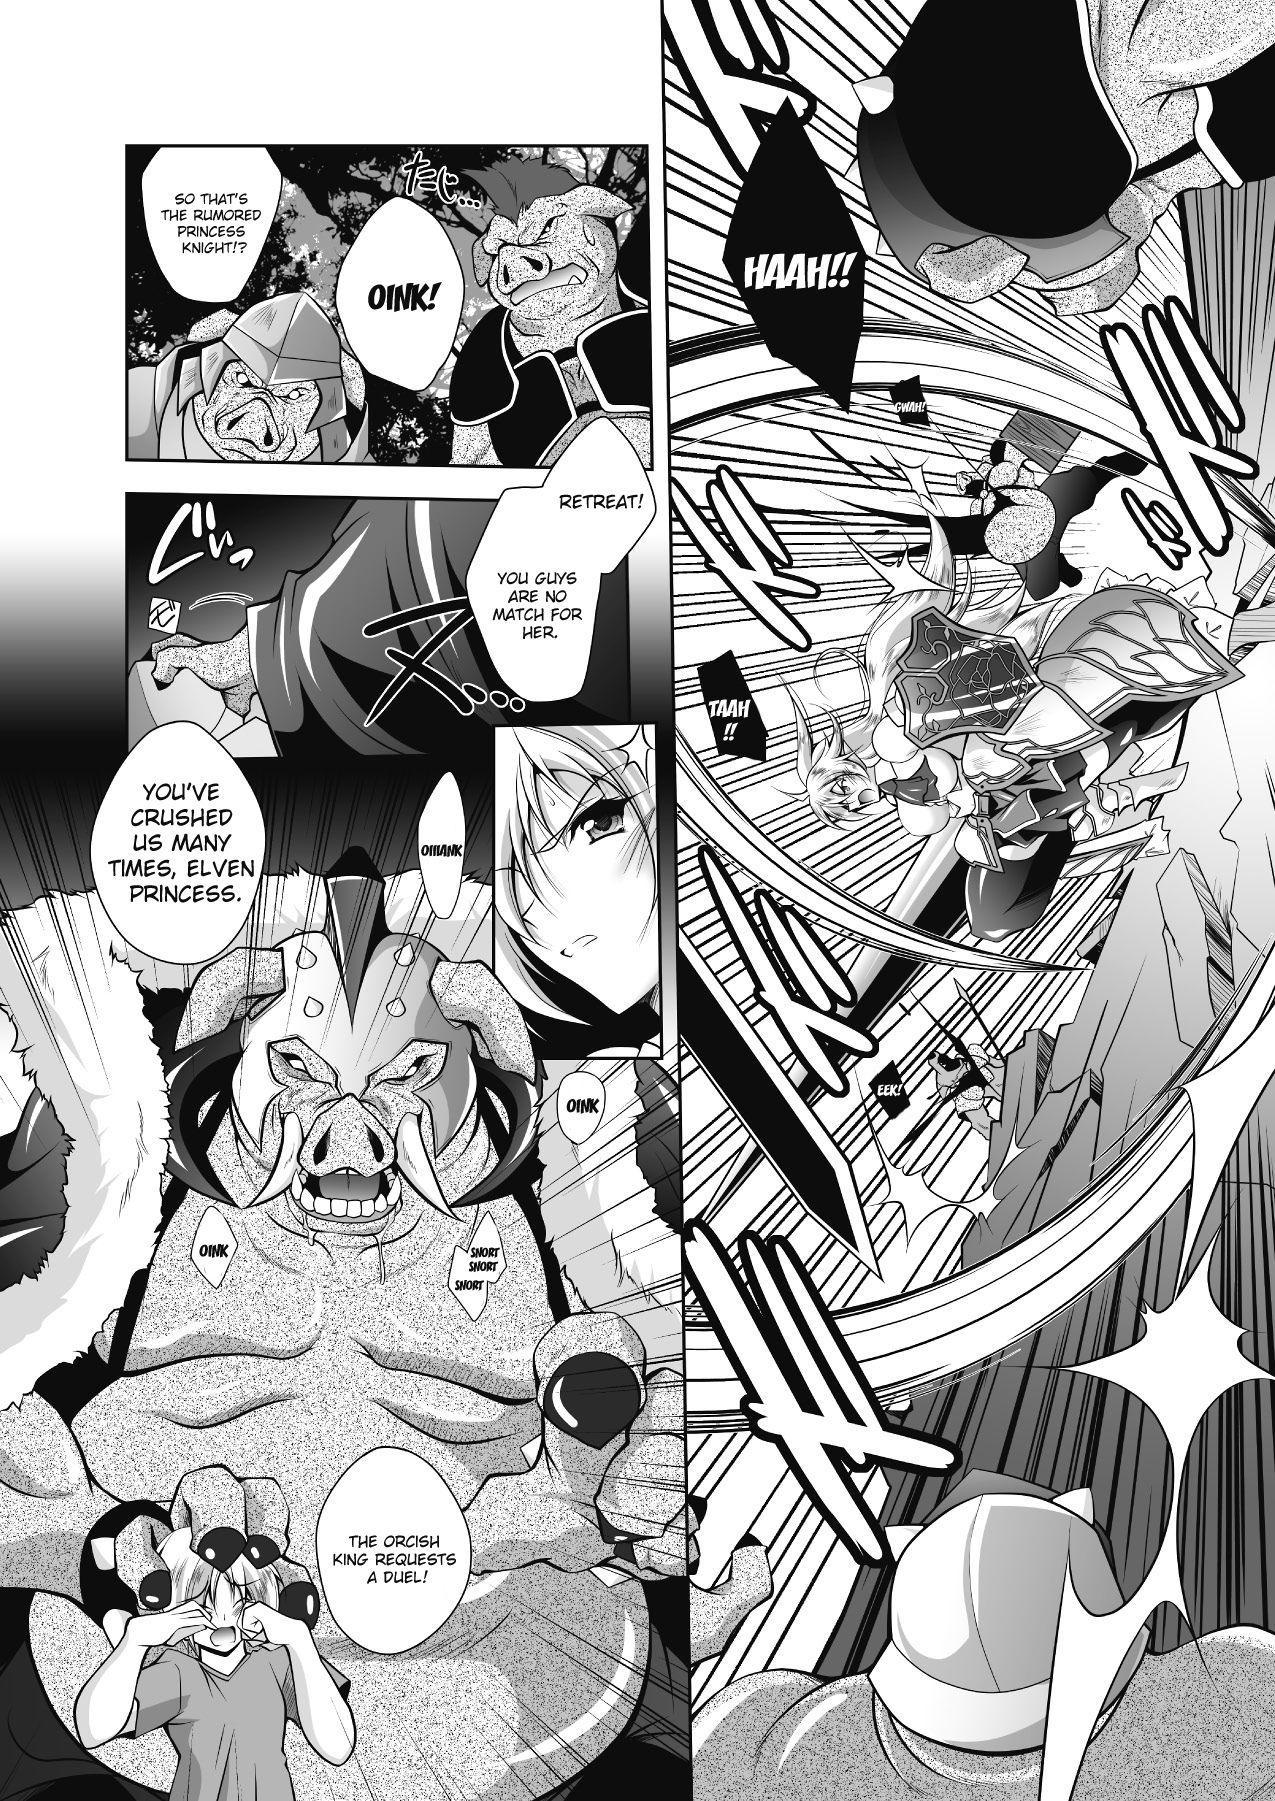 Juuyoku ni Kegareta Erufu Hime Kishi Sefiria | An Elf Sullied by Bestial Lust Princess Knight Sefiria 1